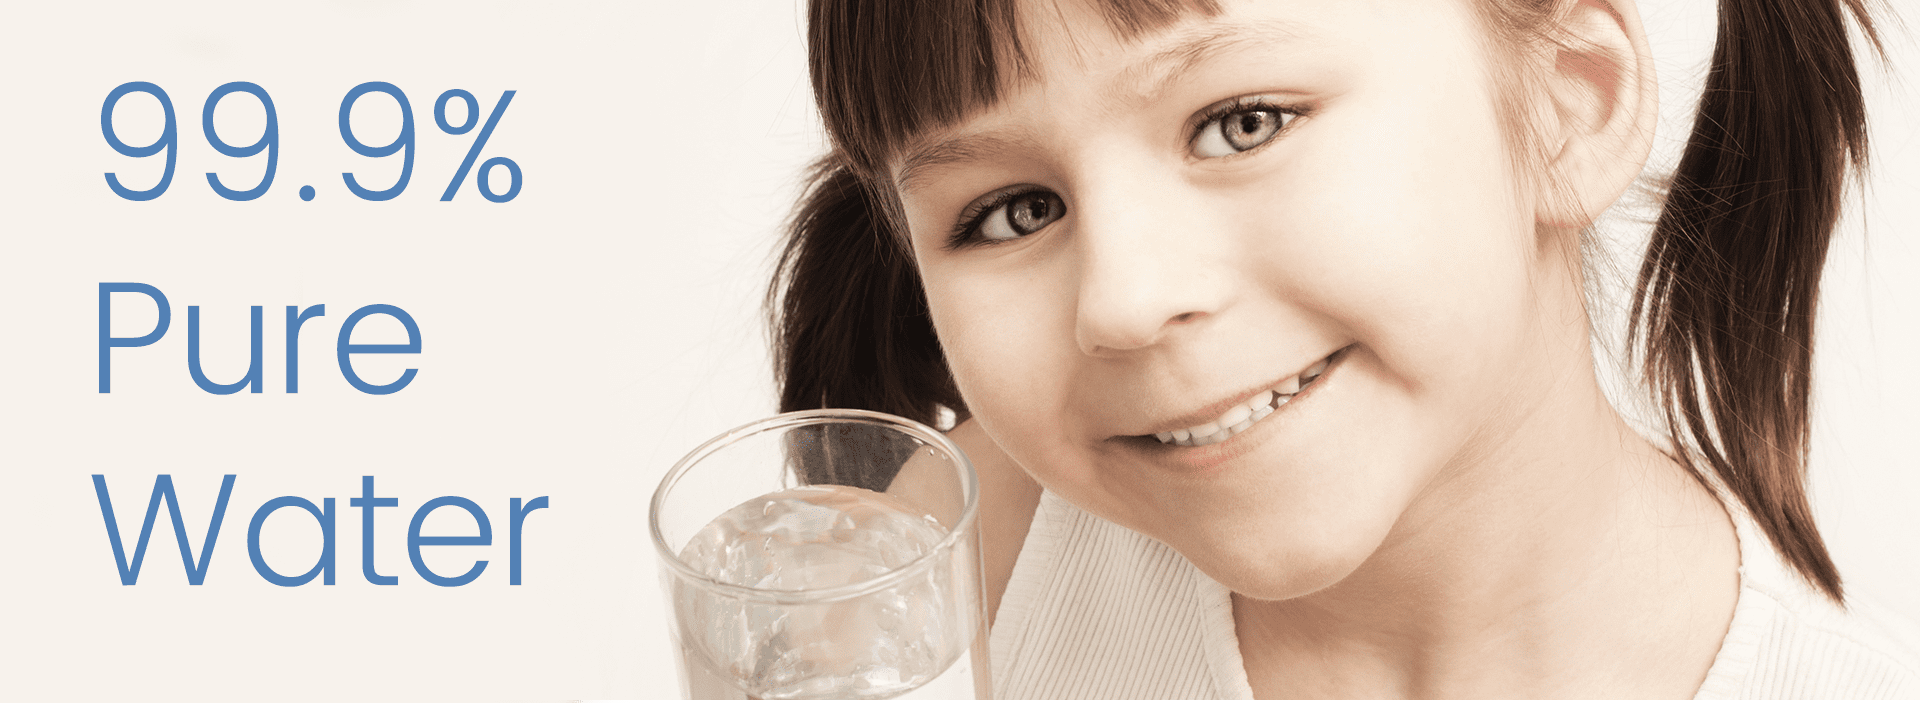 pure vapor distilled drinking water